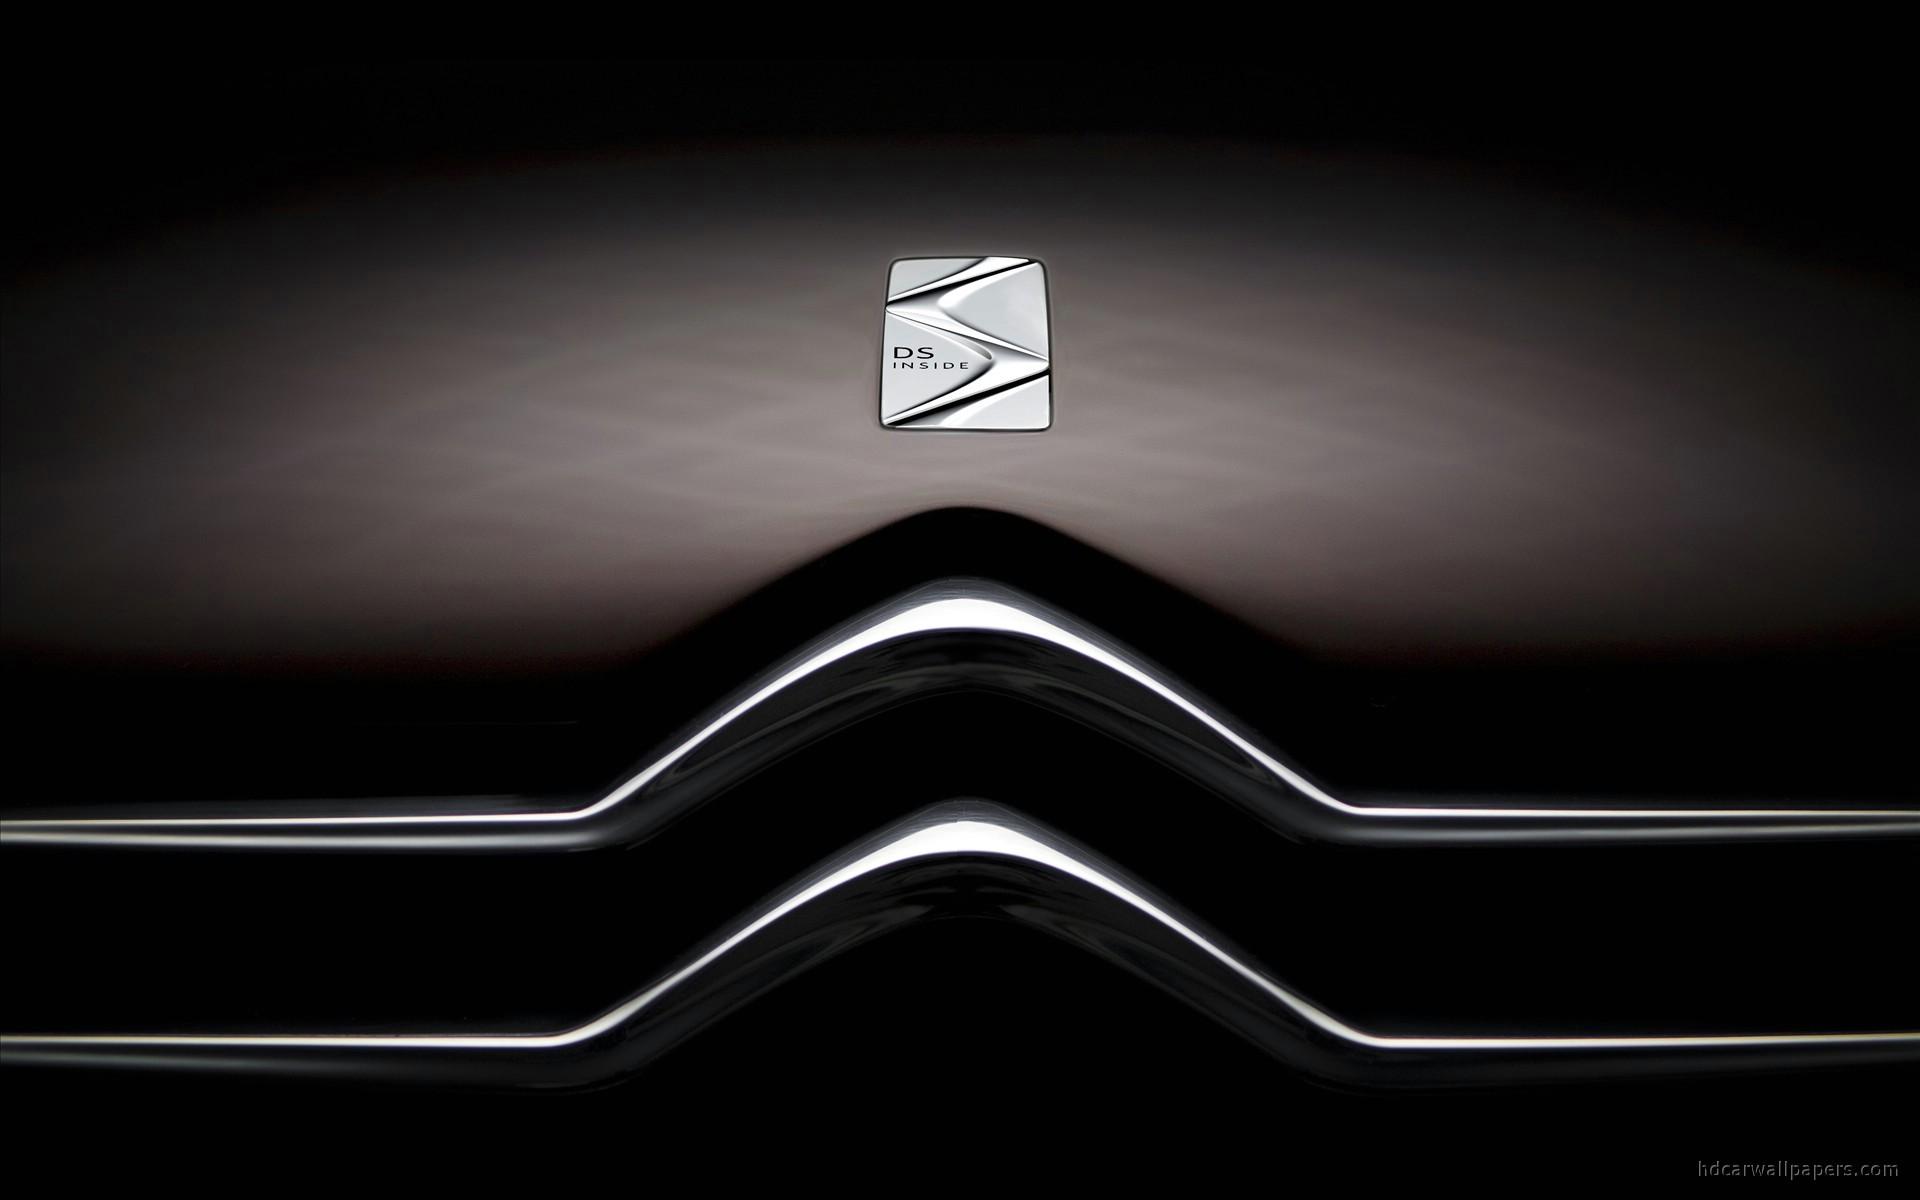 Citroen ds inside logo wallpaper hd car wallpapers id 385 - Car logo wallpapers ...